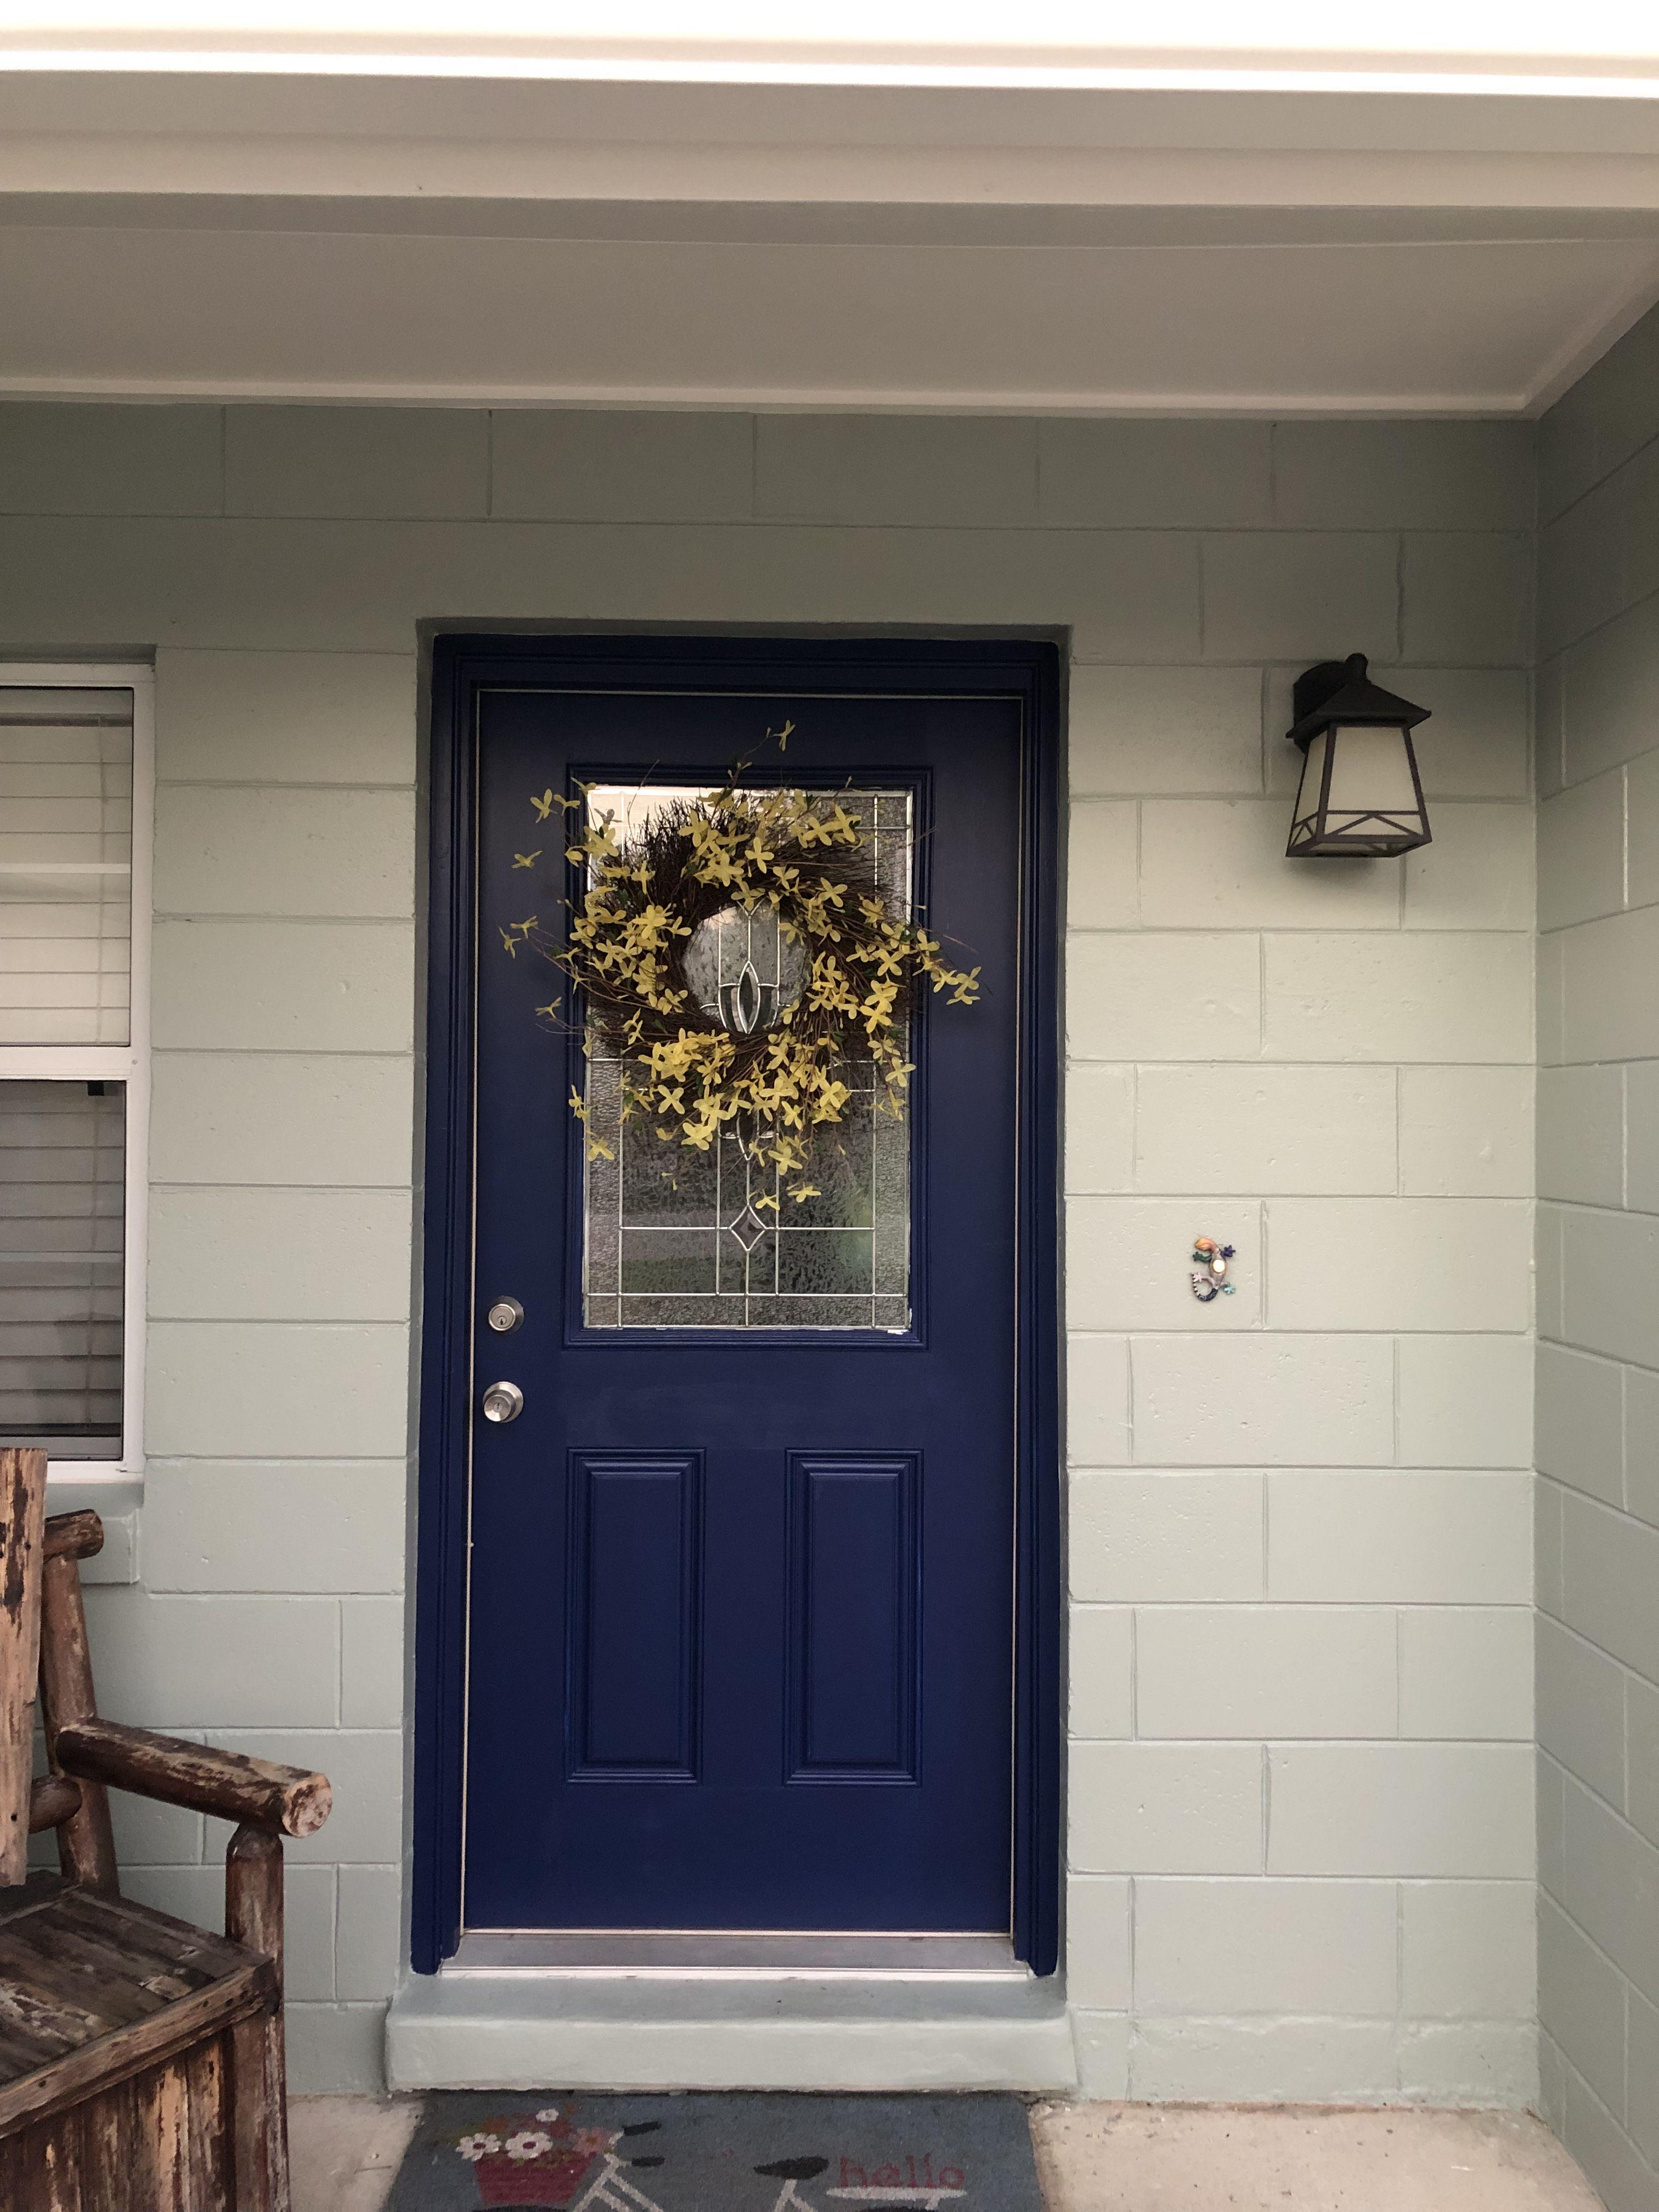 Base Sw Oyster Bay Trim Sw Alabaster Door Sw Dress Blues Paint Color Inspiration House Exterior Oyster Bay [ 4032 x 3024 Pixel ]